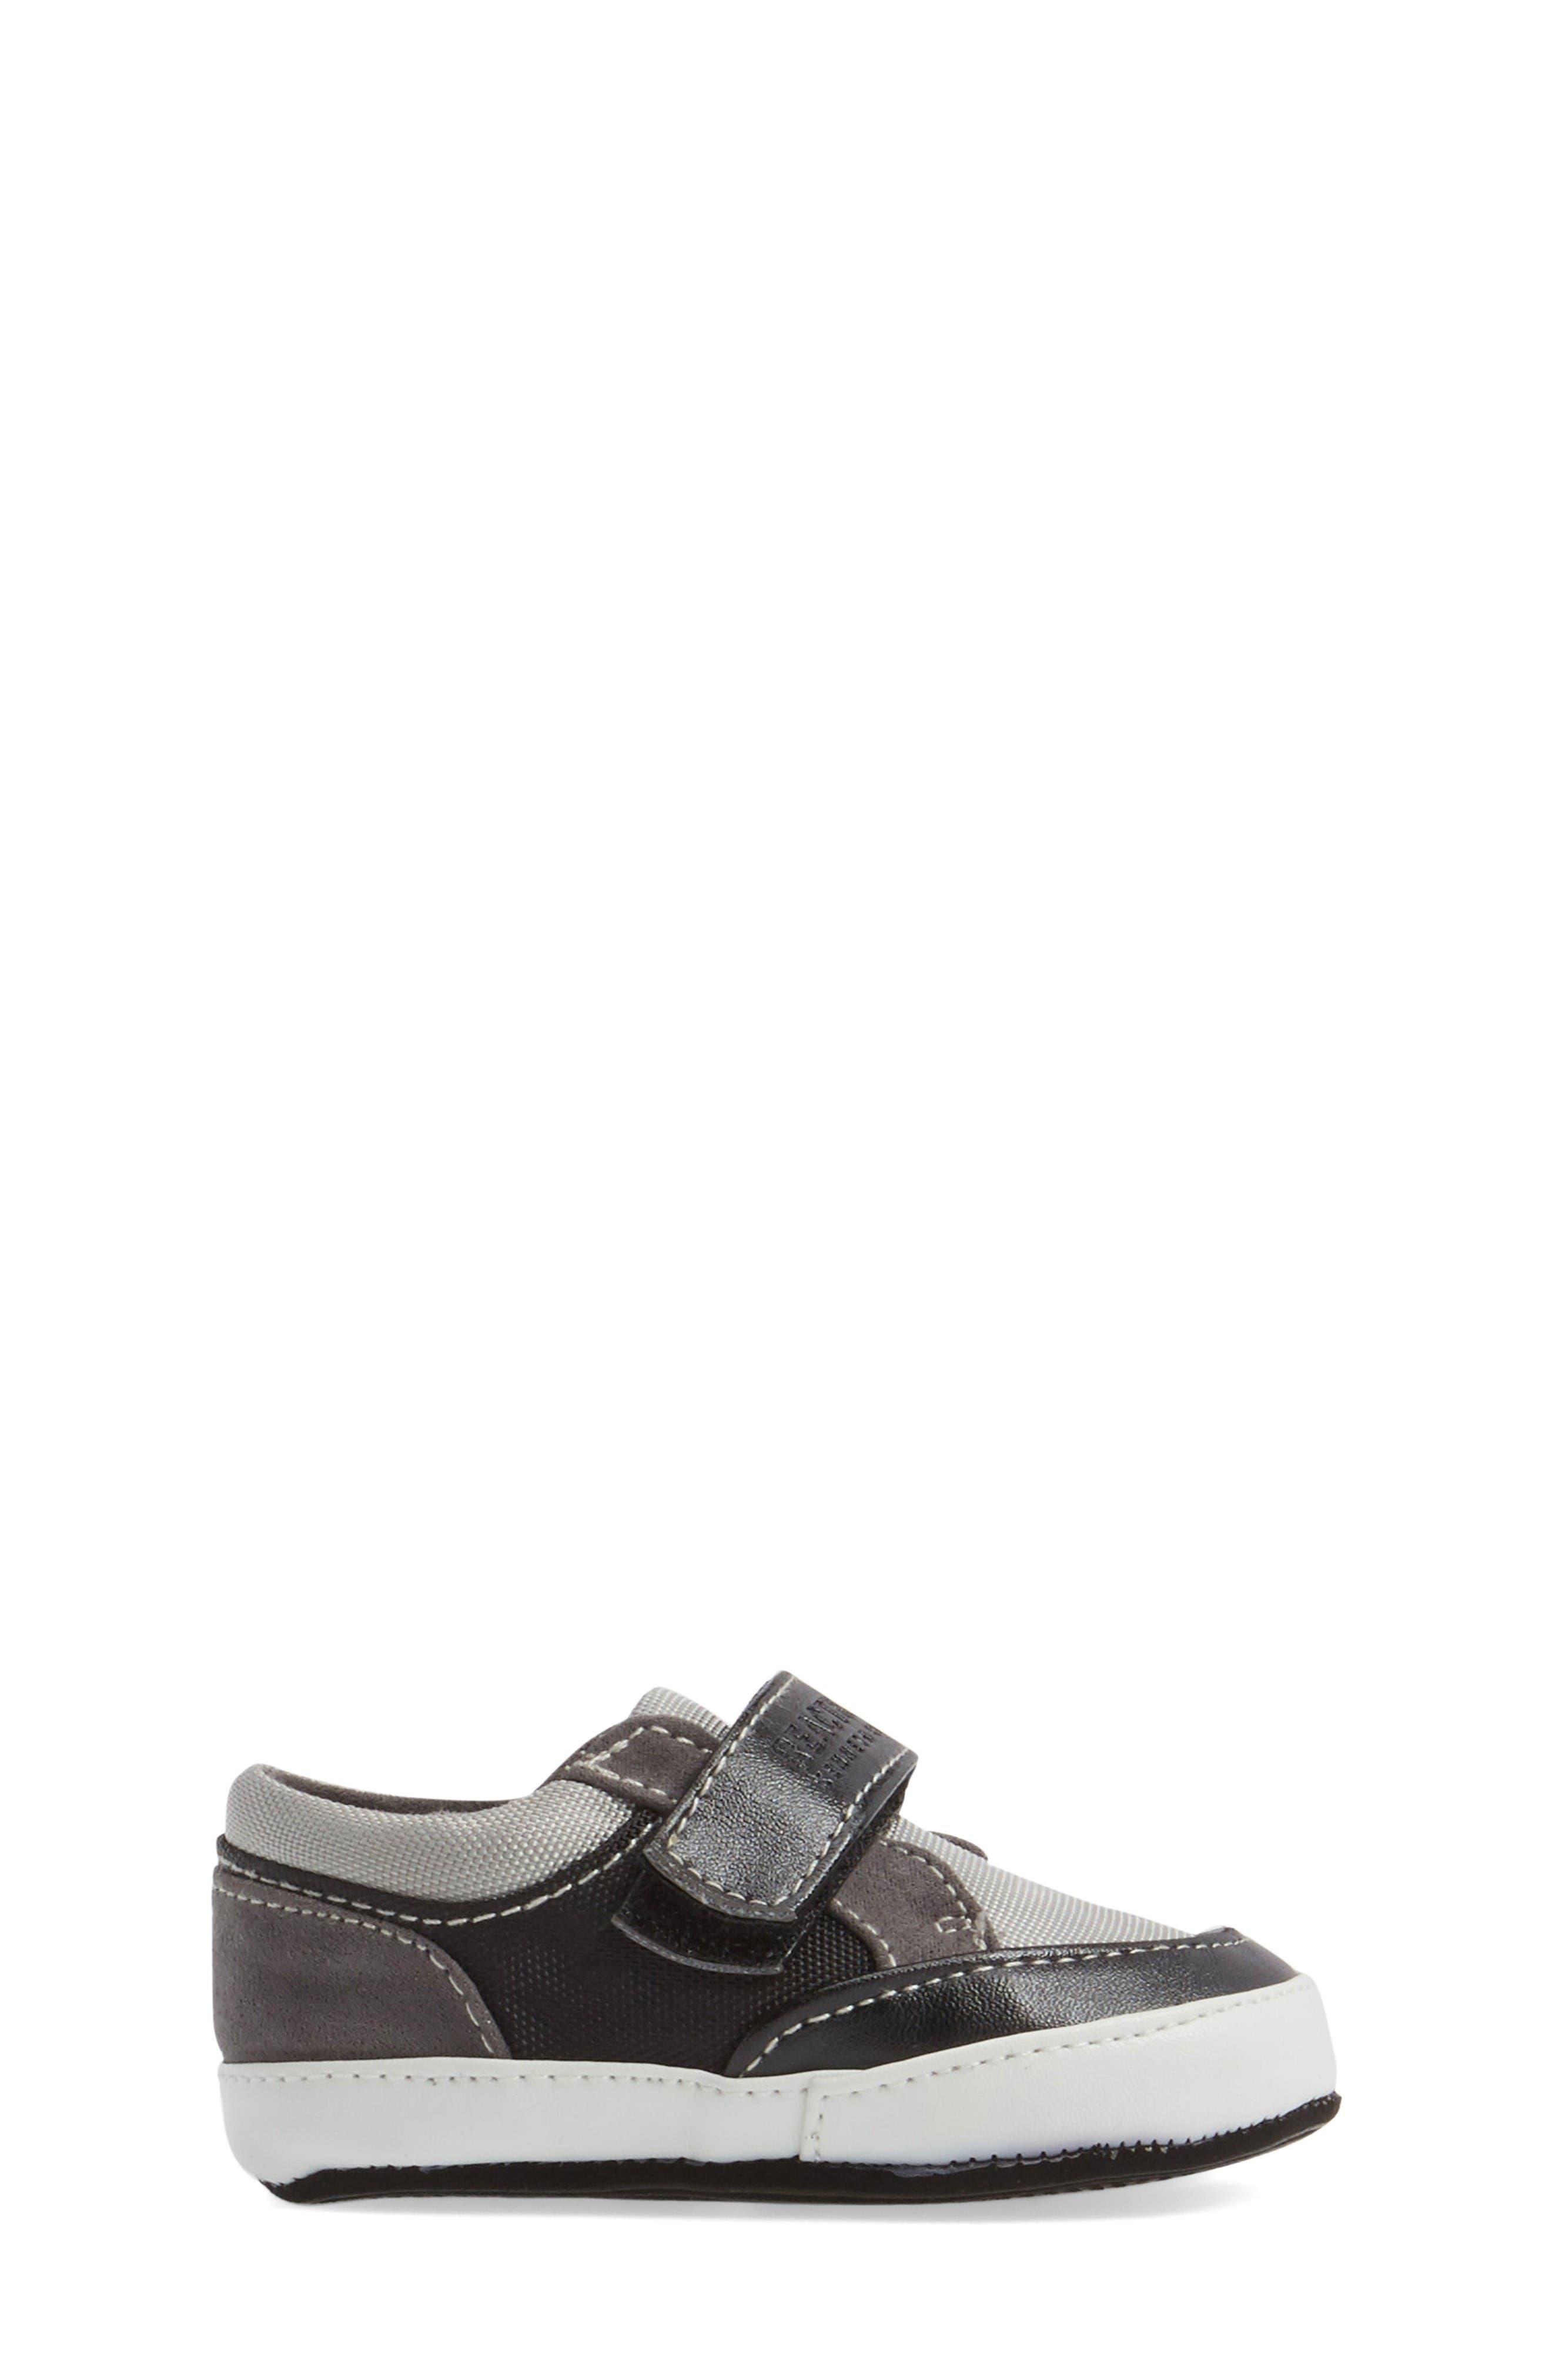 Alternate Image 3  - Kenneth Cole New York Danny Sneaker (Baby)